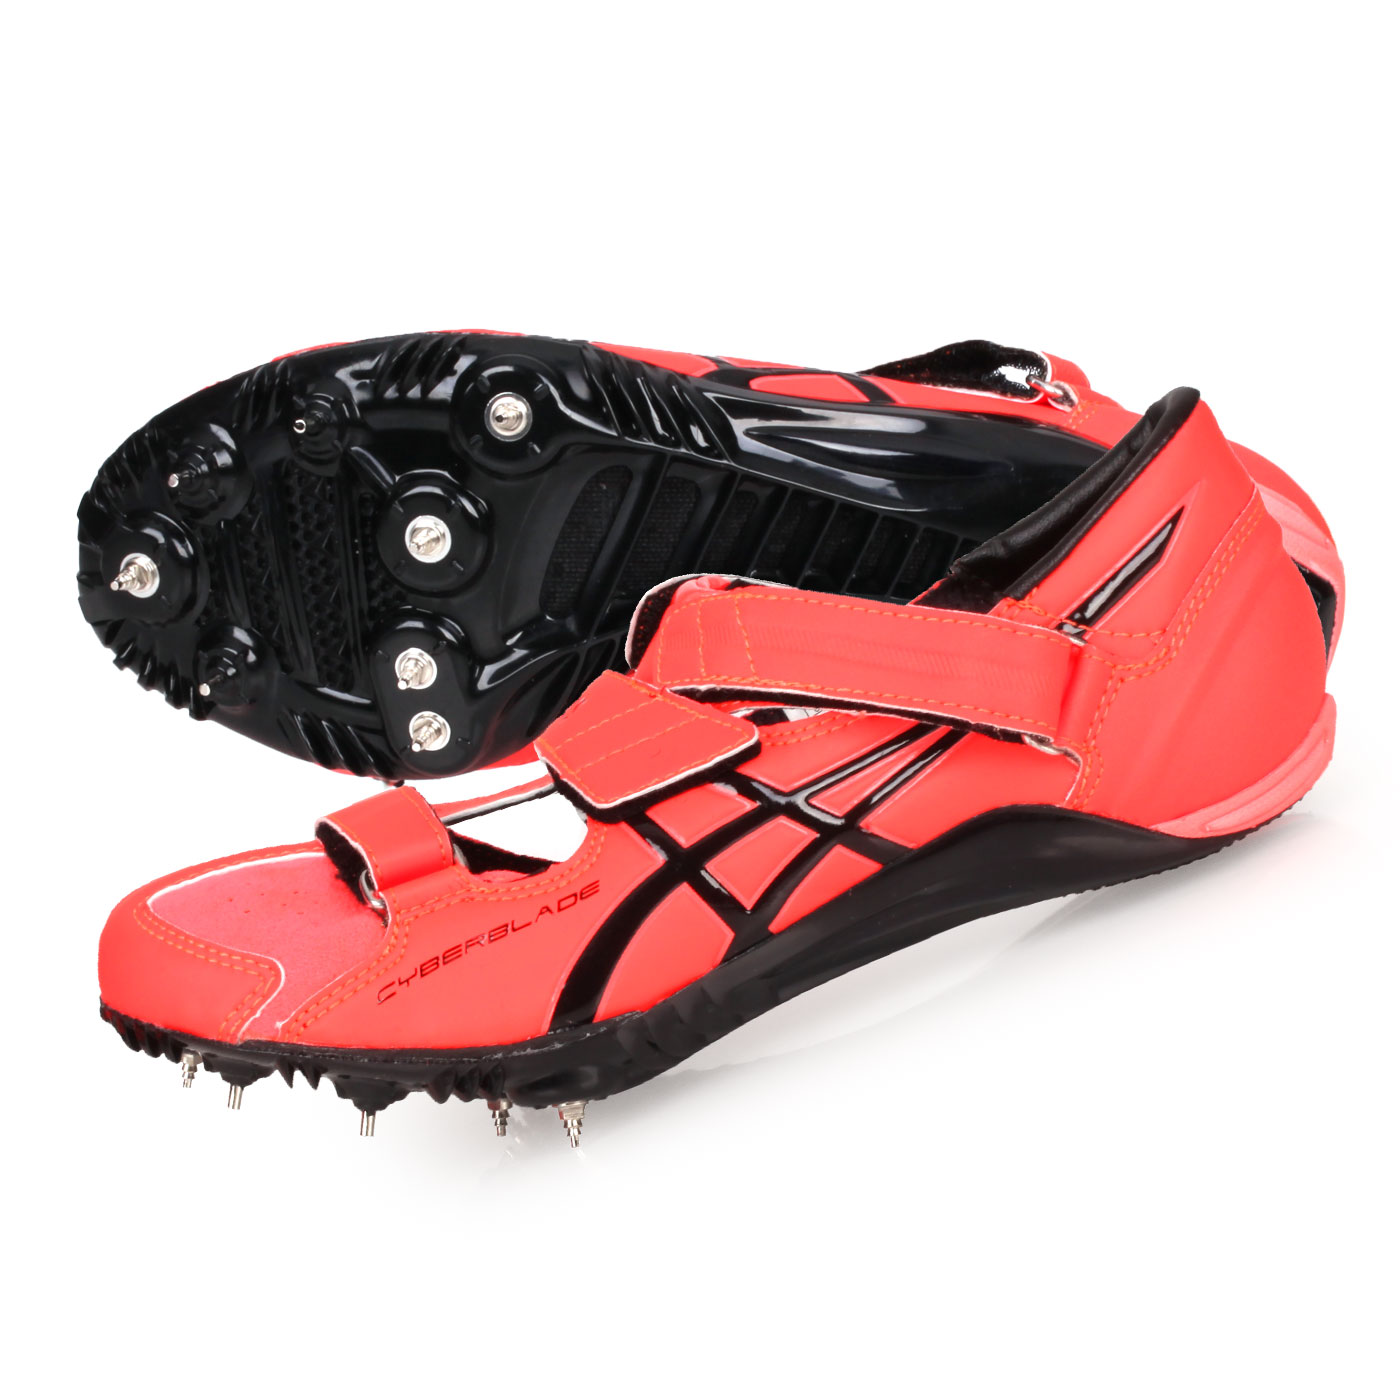 ASICS 日製田徑釘鞋(短距離)  @CYBERBLADE HF@TTP507-701